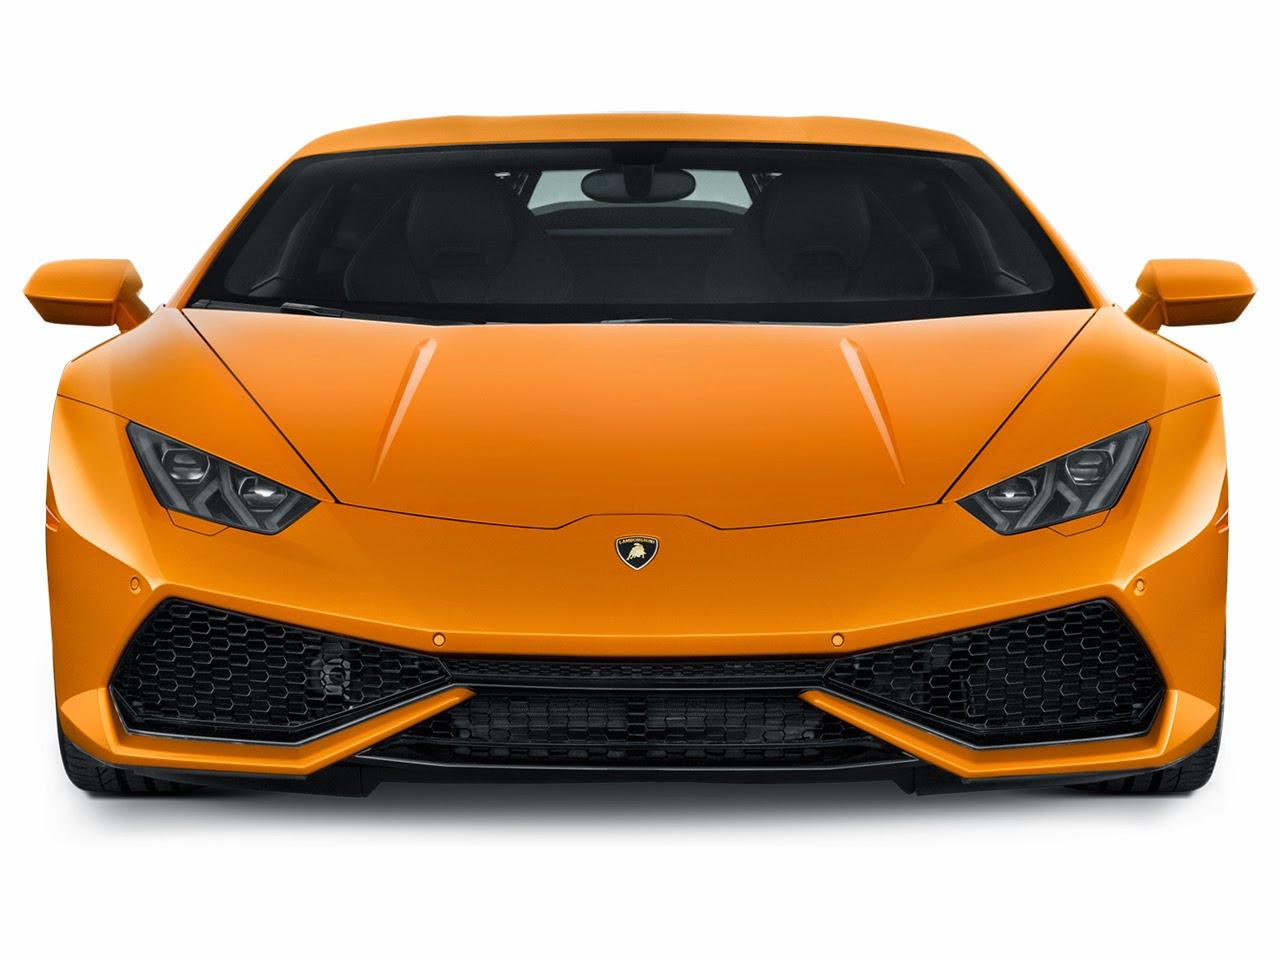 Review Lamborghini Huracan The Famous Brand Cars 2015 Famous